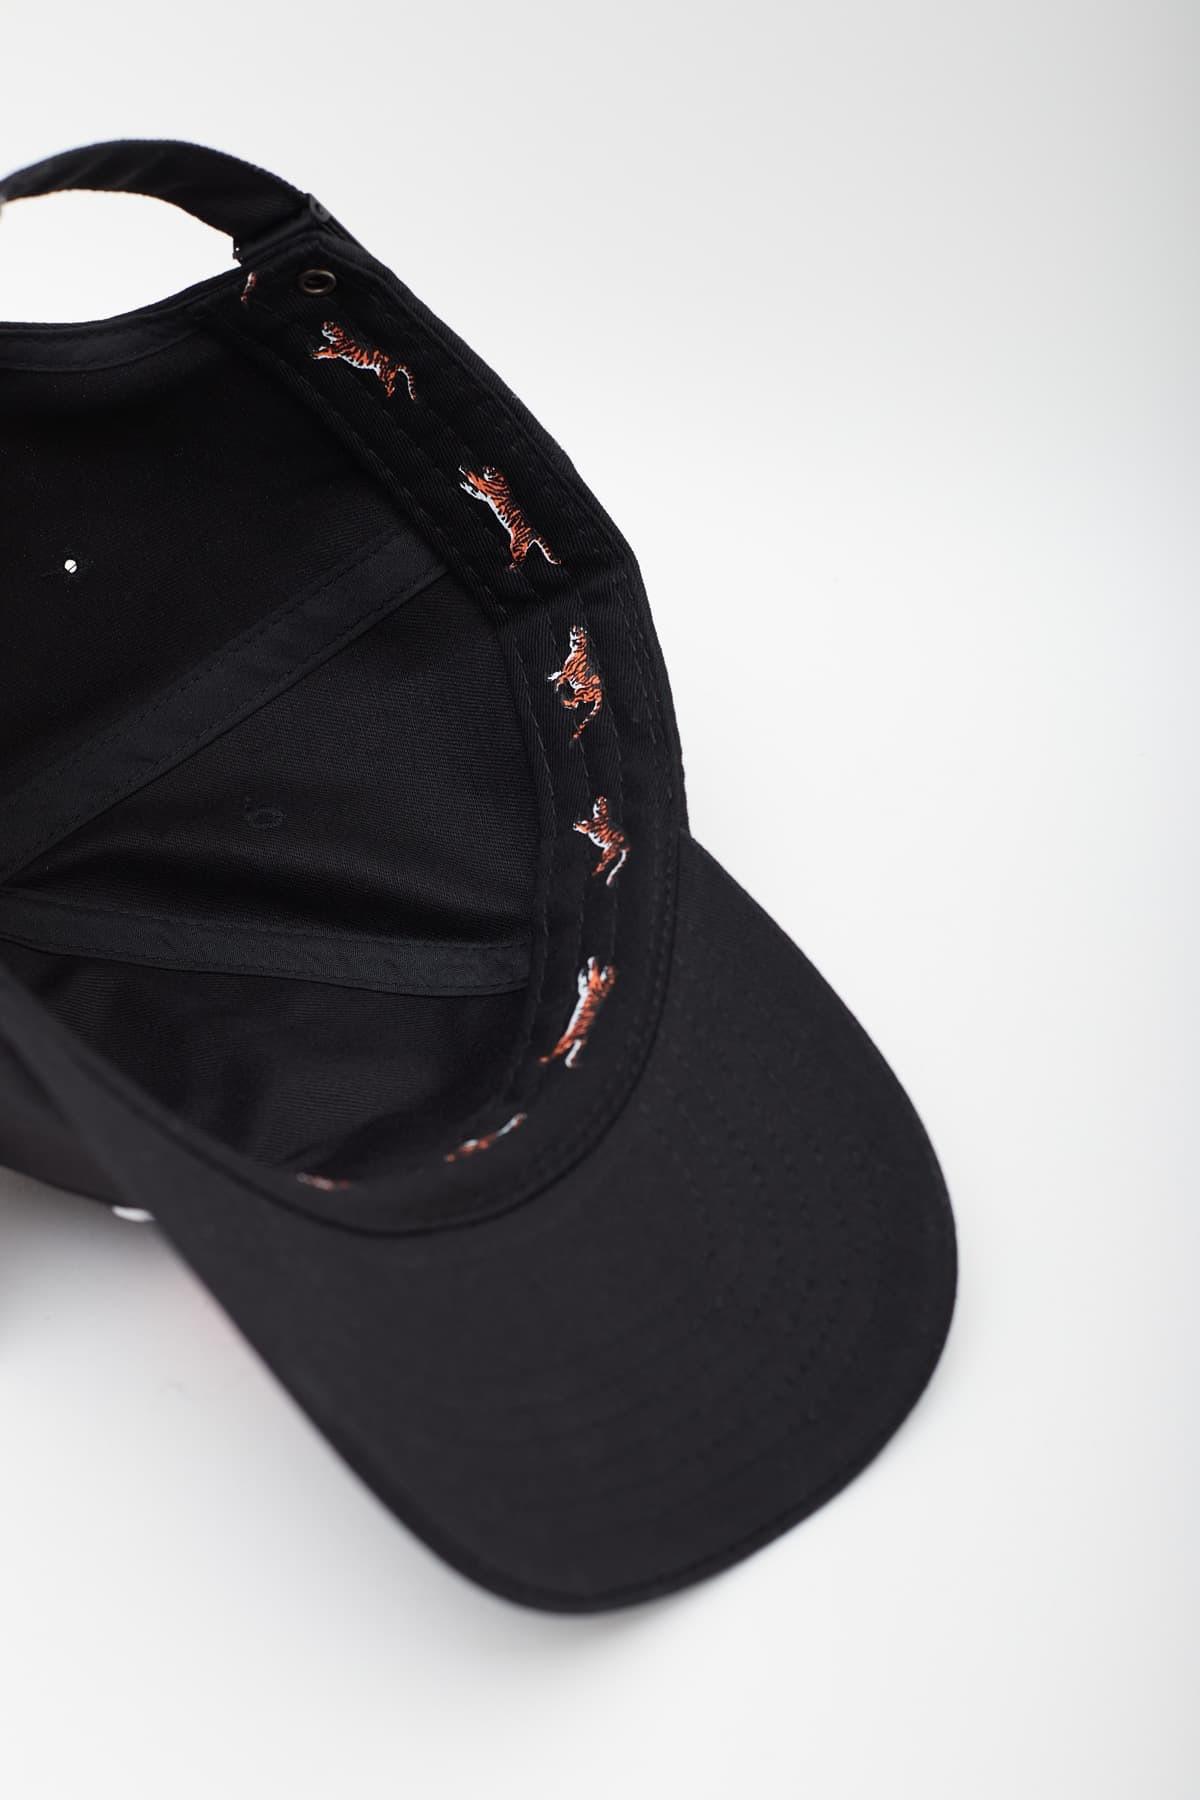 Shop Our Legacy Brown Croco 3.5 Belt